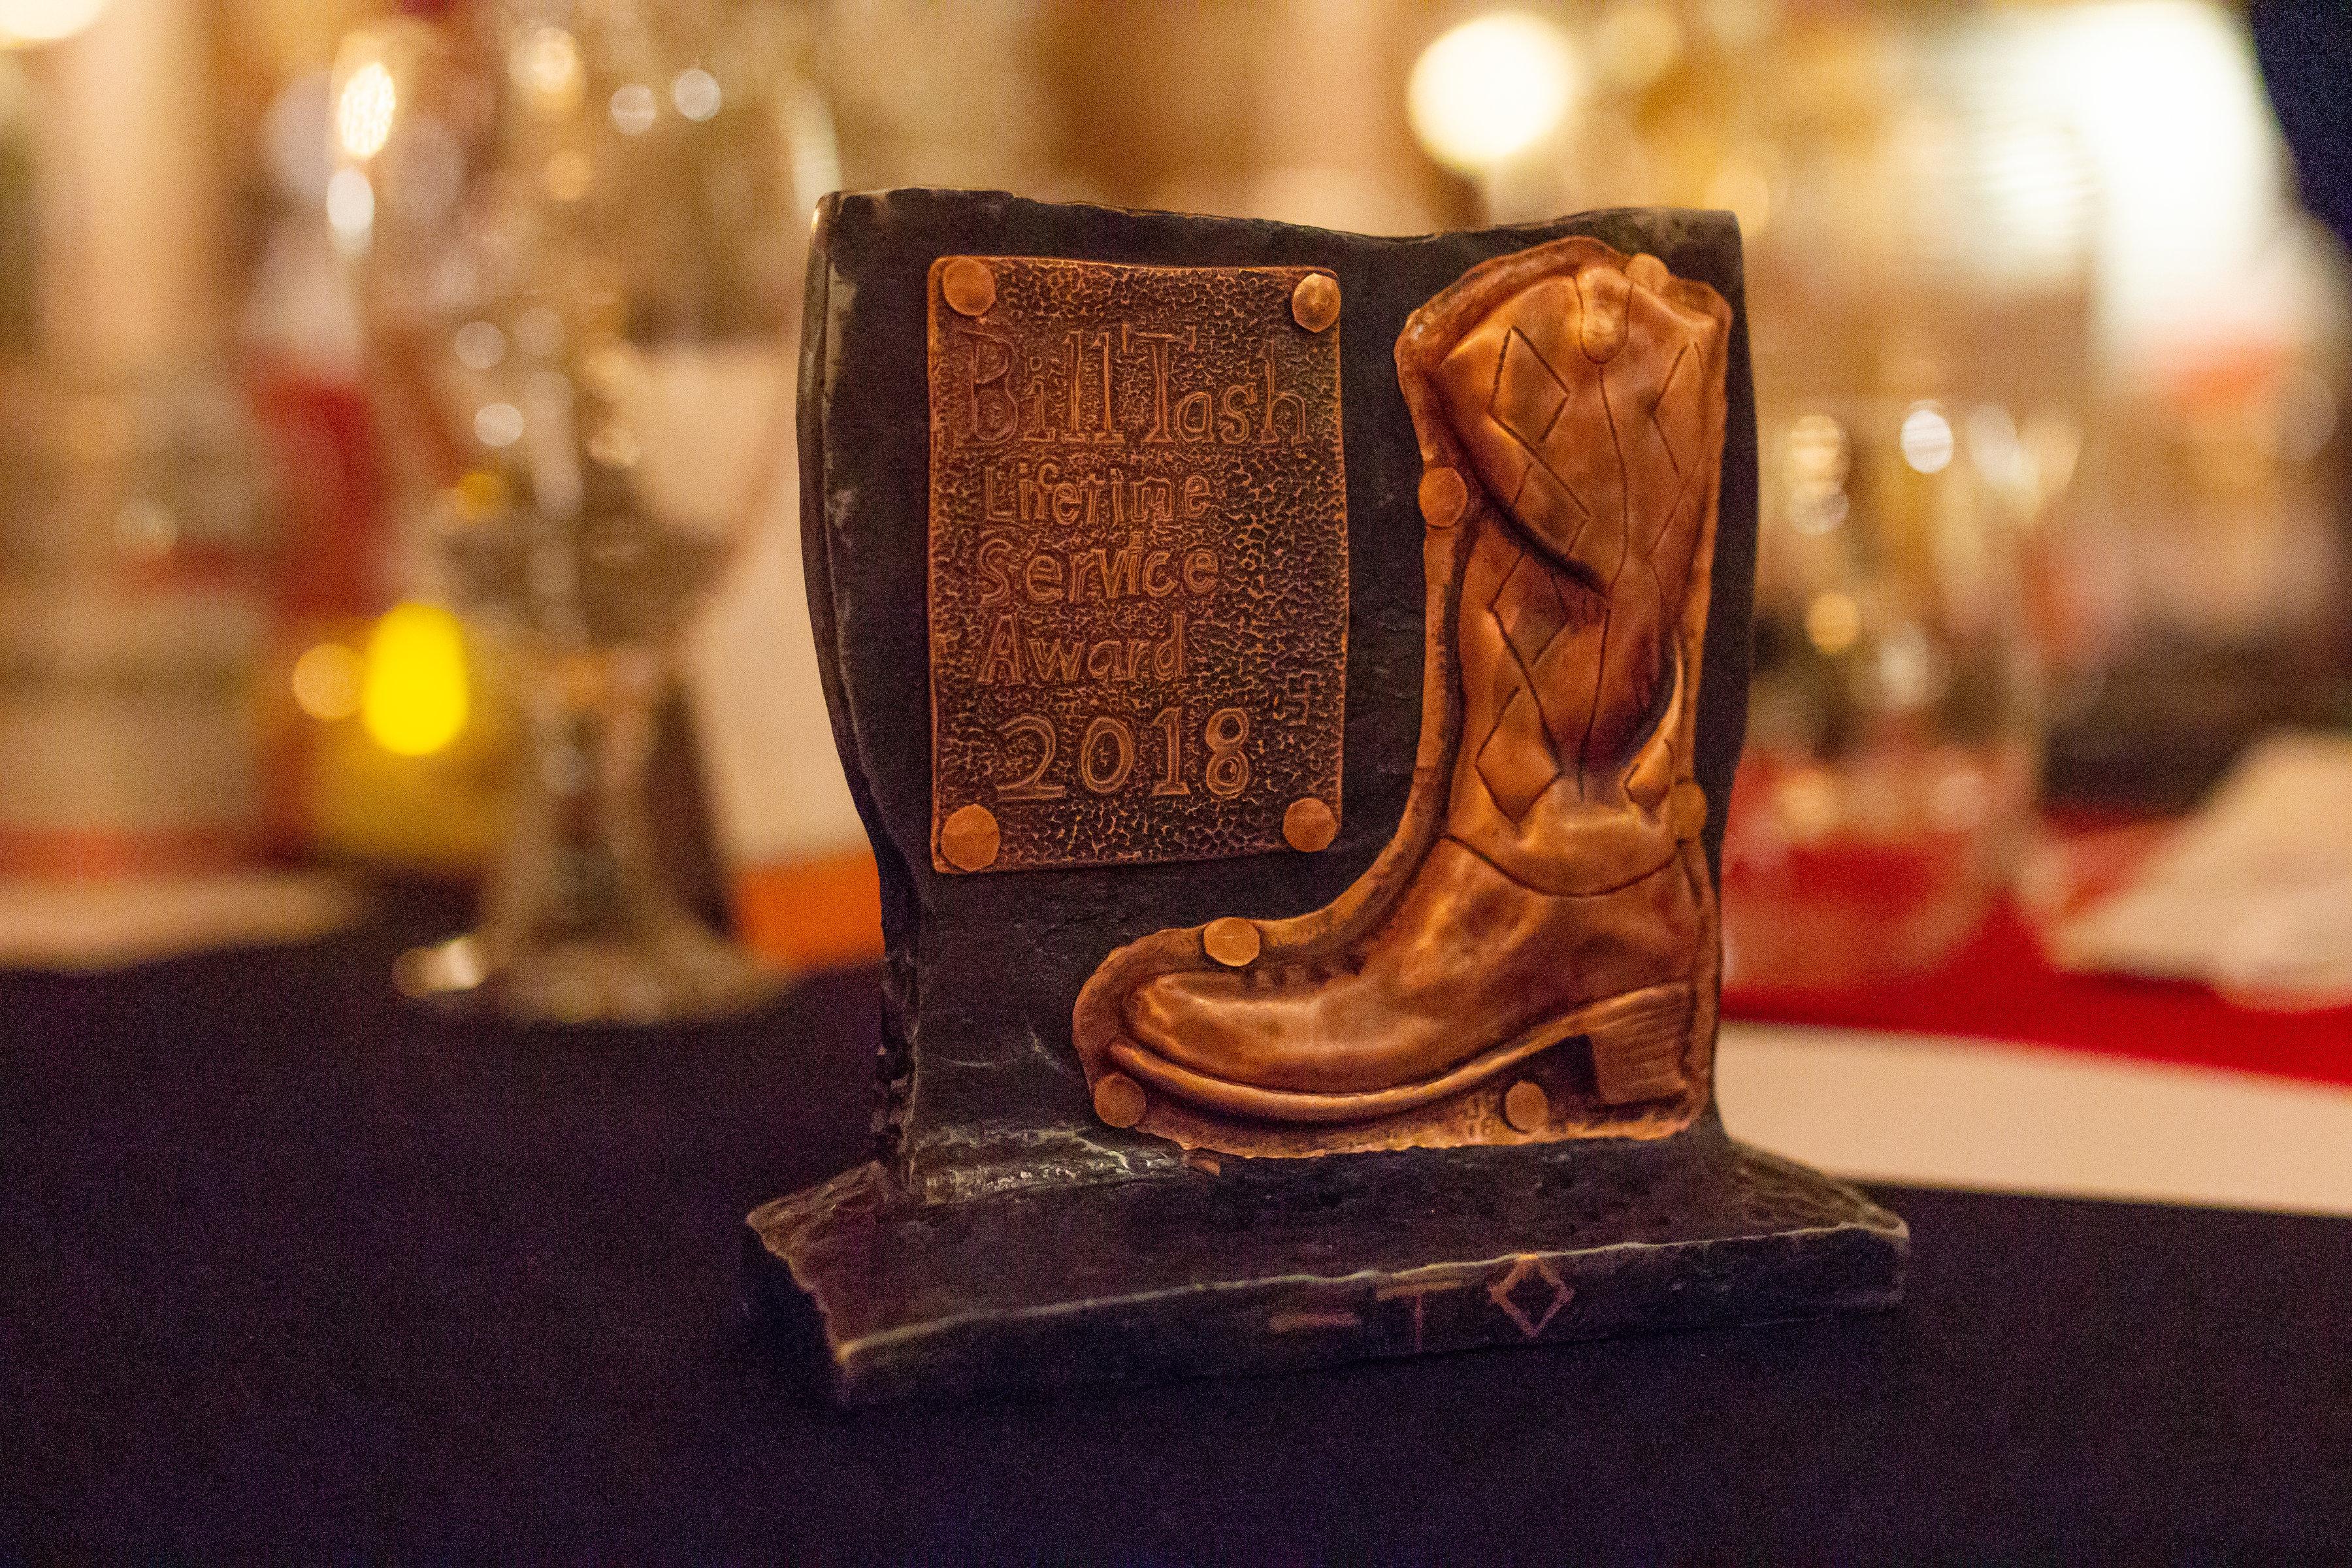 Lifetime Service Award